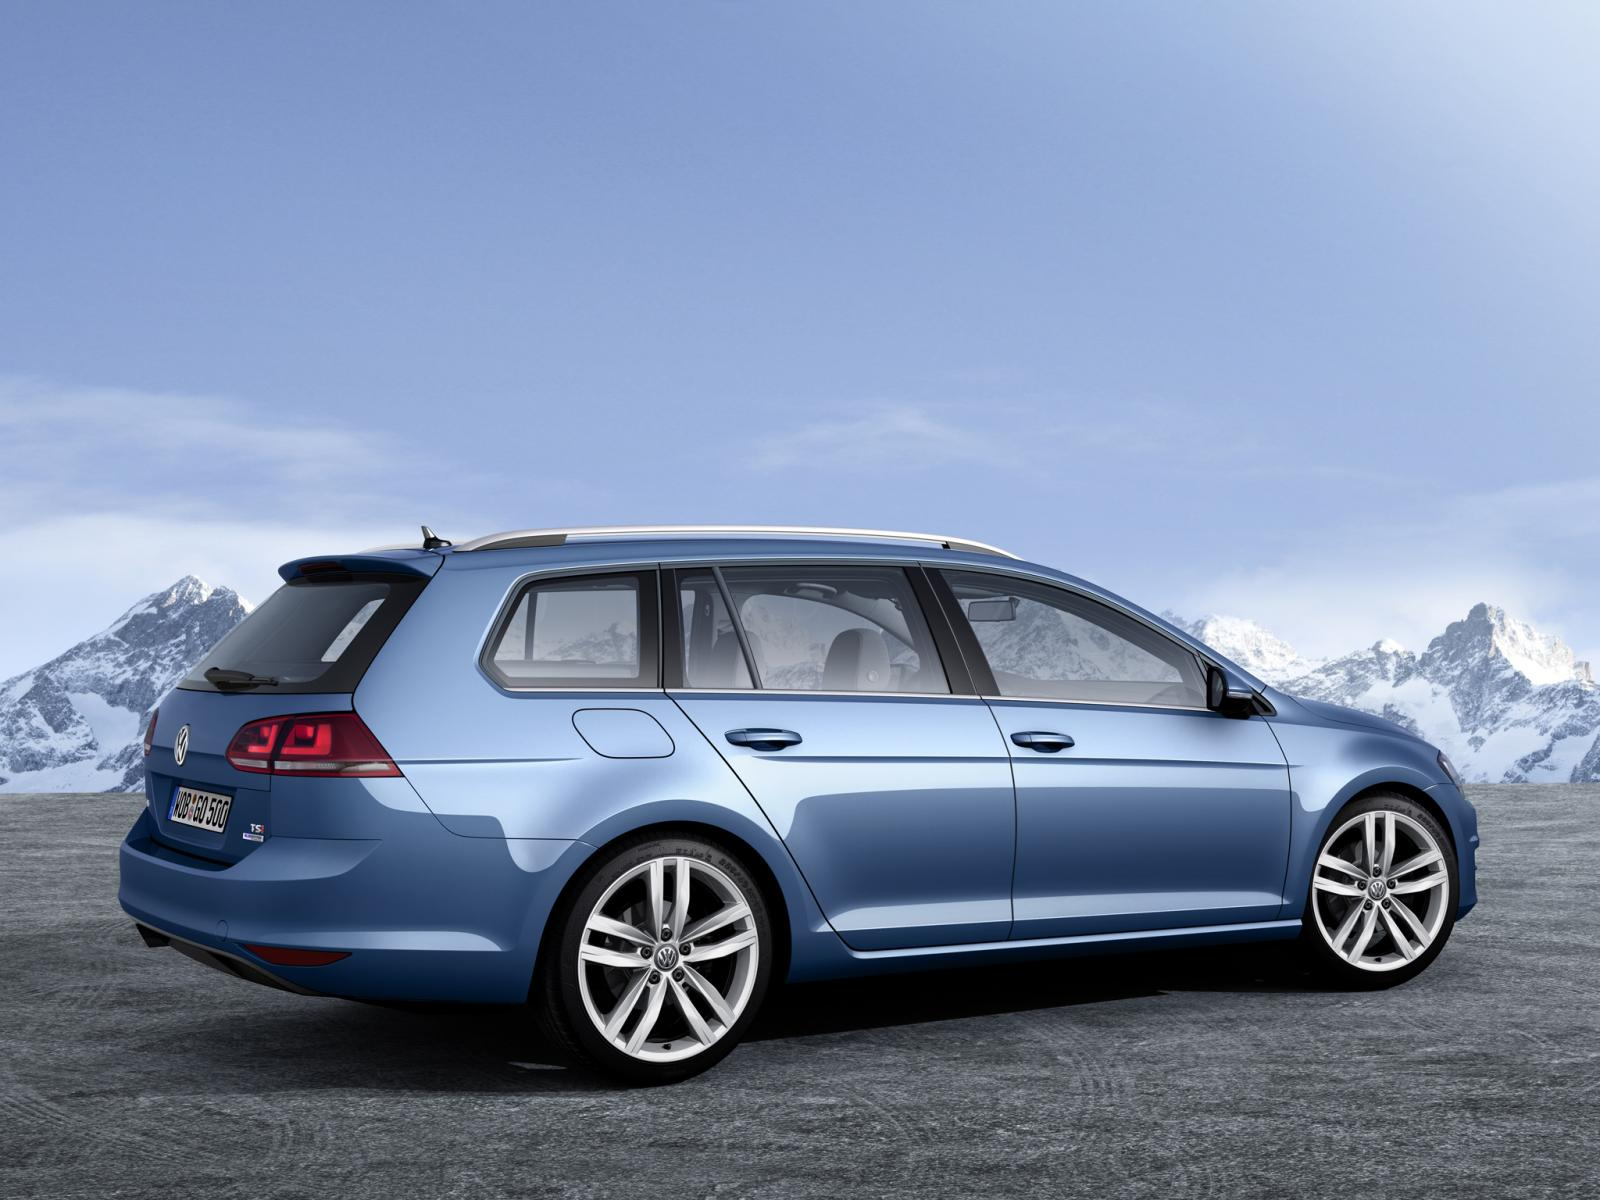 Vw Golf 7 Variant >> Volkswagen Golf Vii Variant Specs Photos 2013 2014